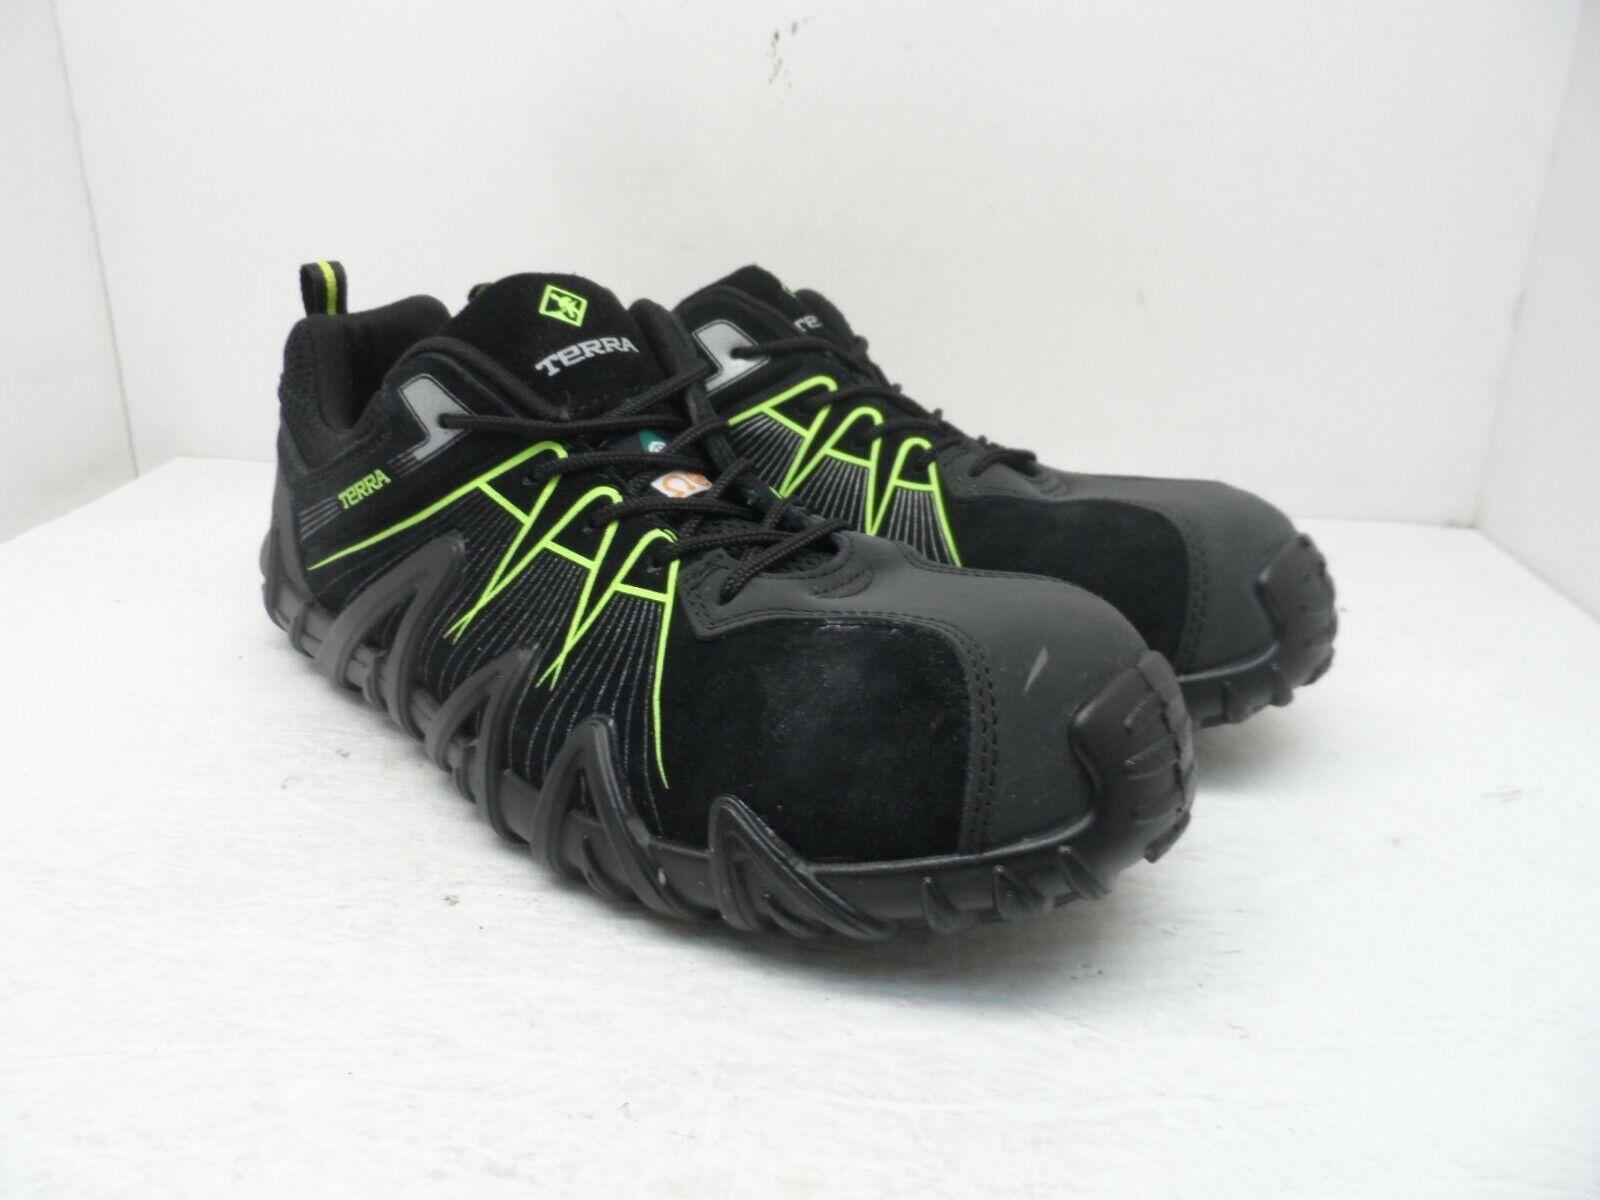 TERRA Men's Spider 3.0 Composite Toe Composite Plate Athletic Shoes Black 12M